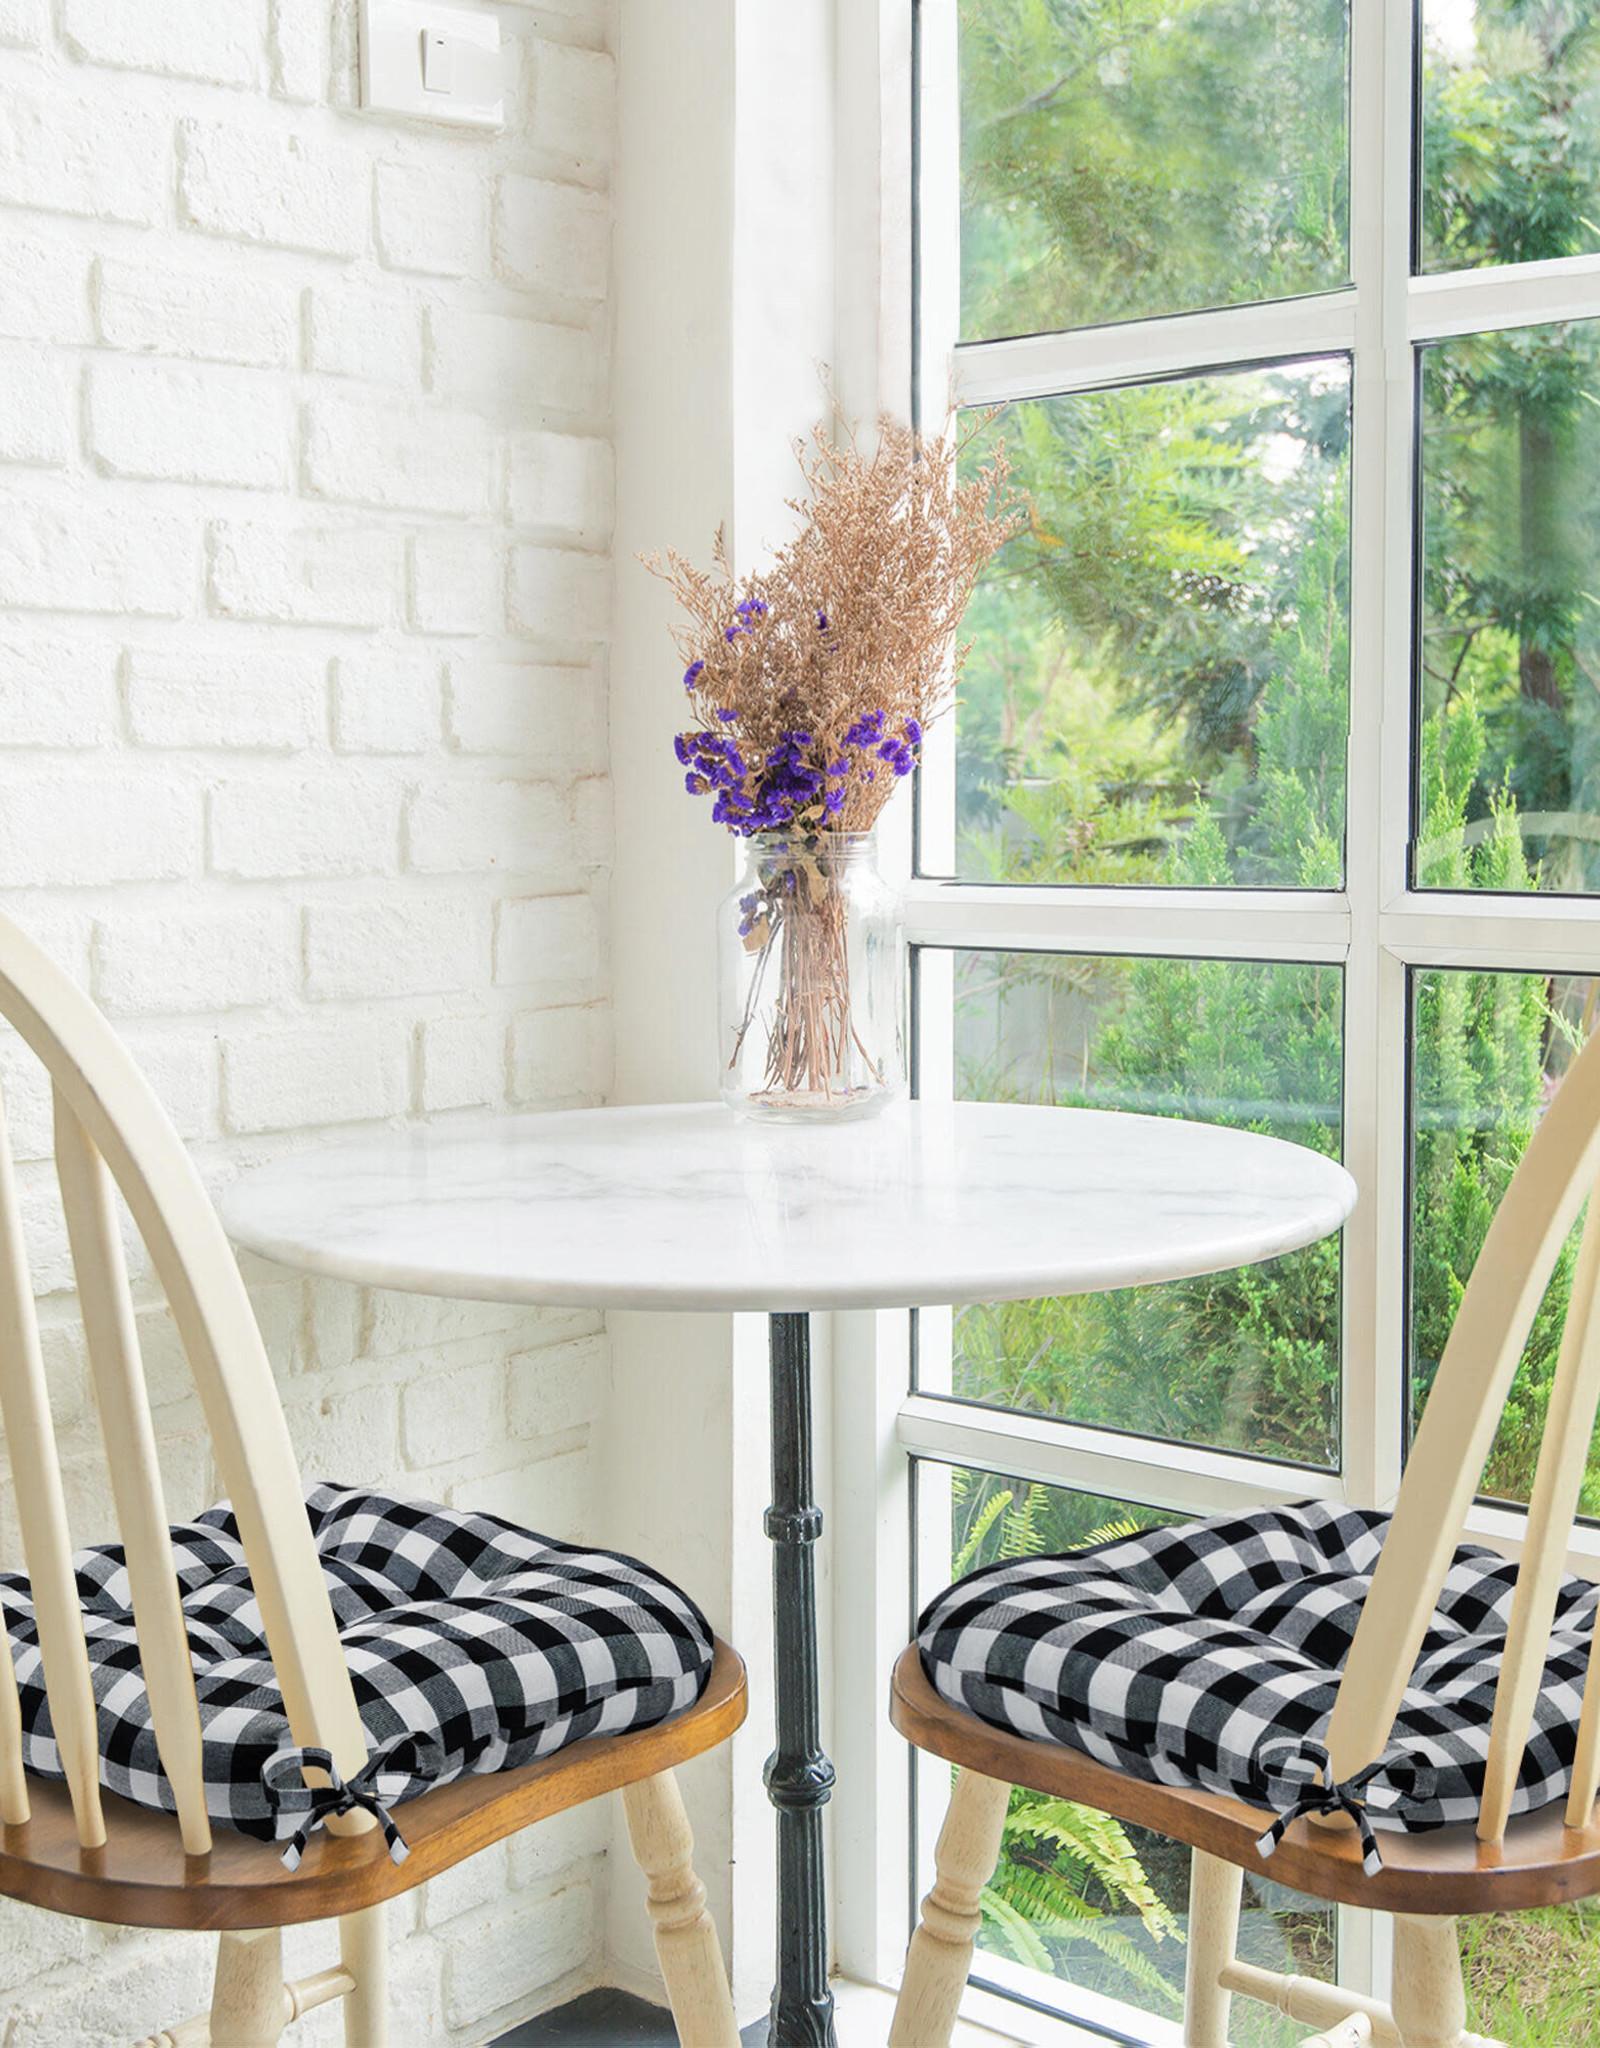 ACHIM Buffalo Check Black/White Checkered Tufted Seat Cushion Chair Pad (Set of 2)